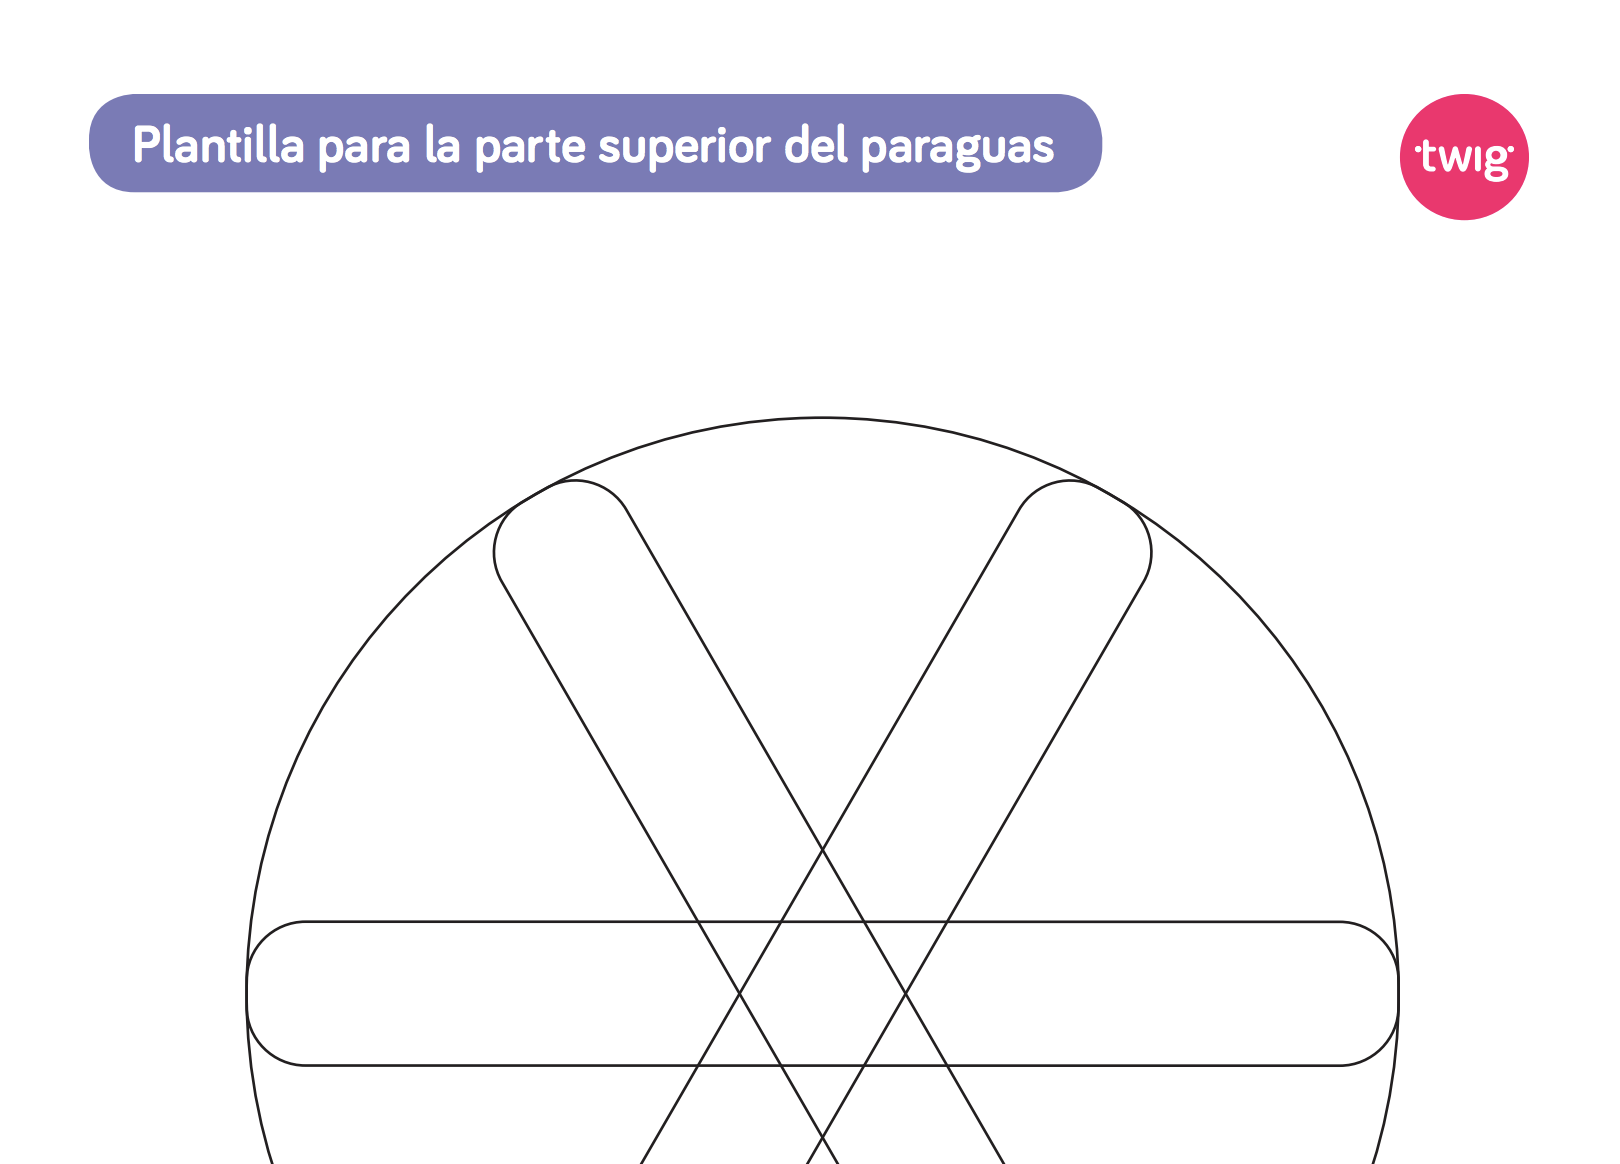 Ficha Plantilla para la parte superior del paraguas